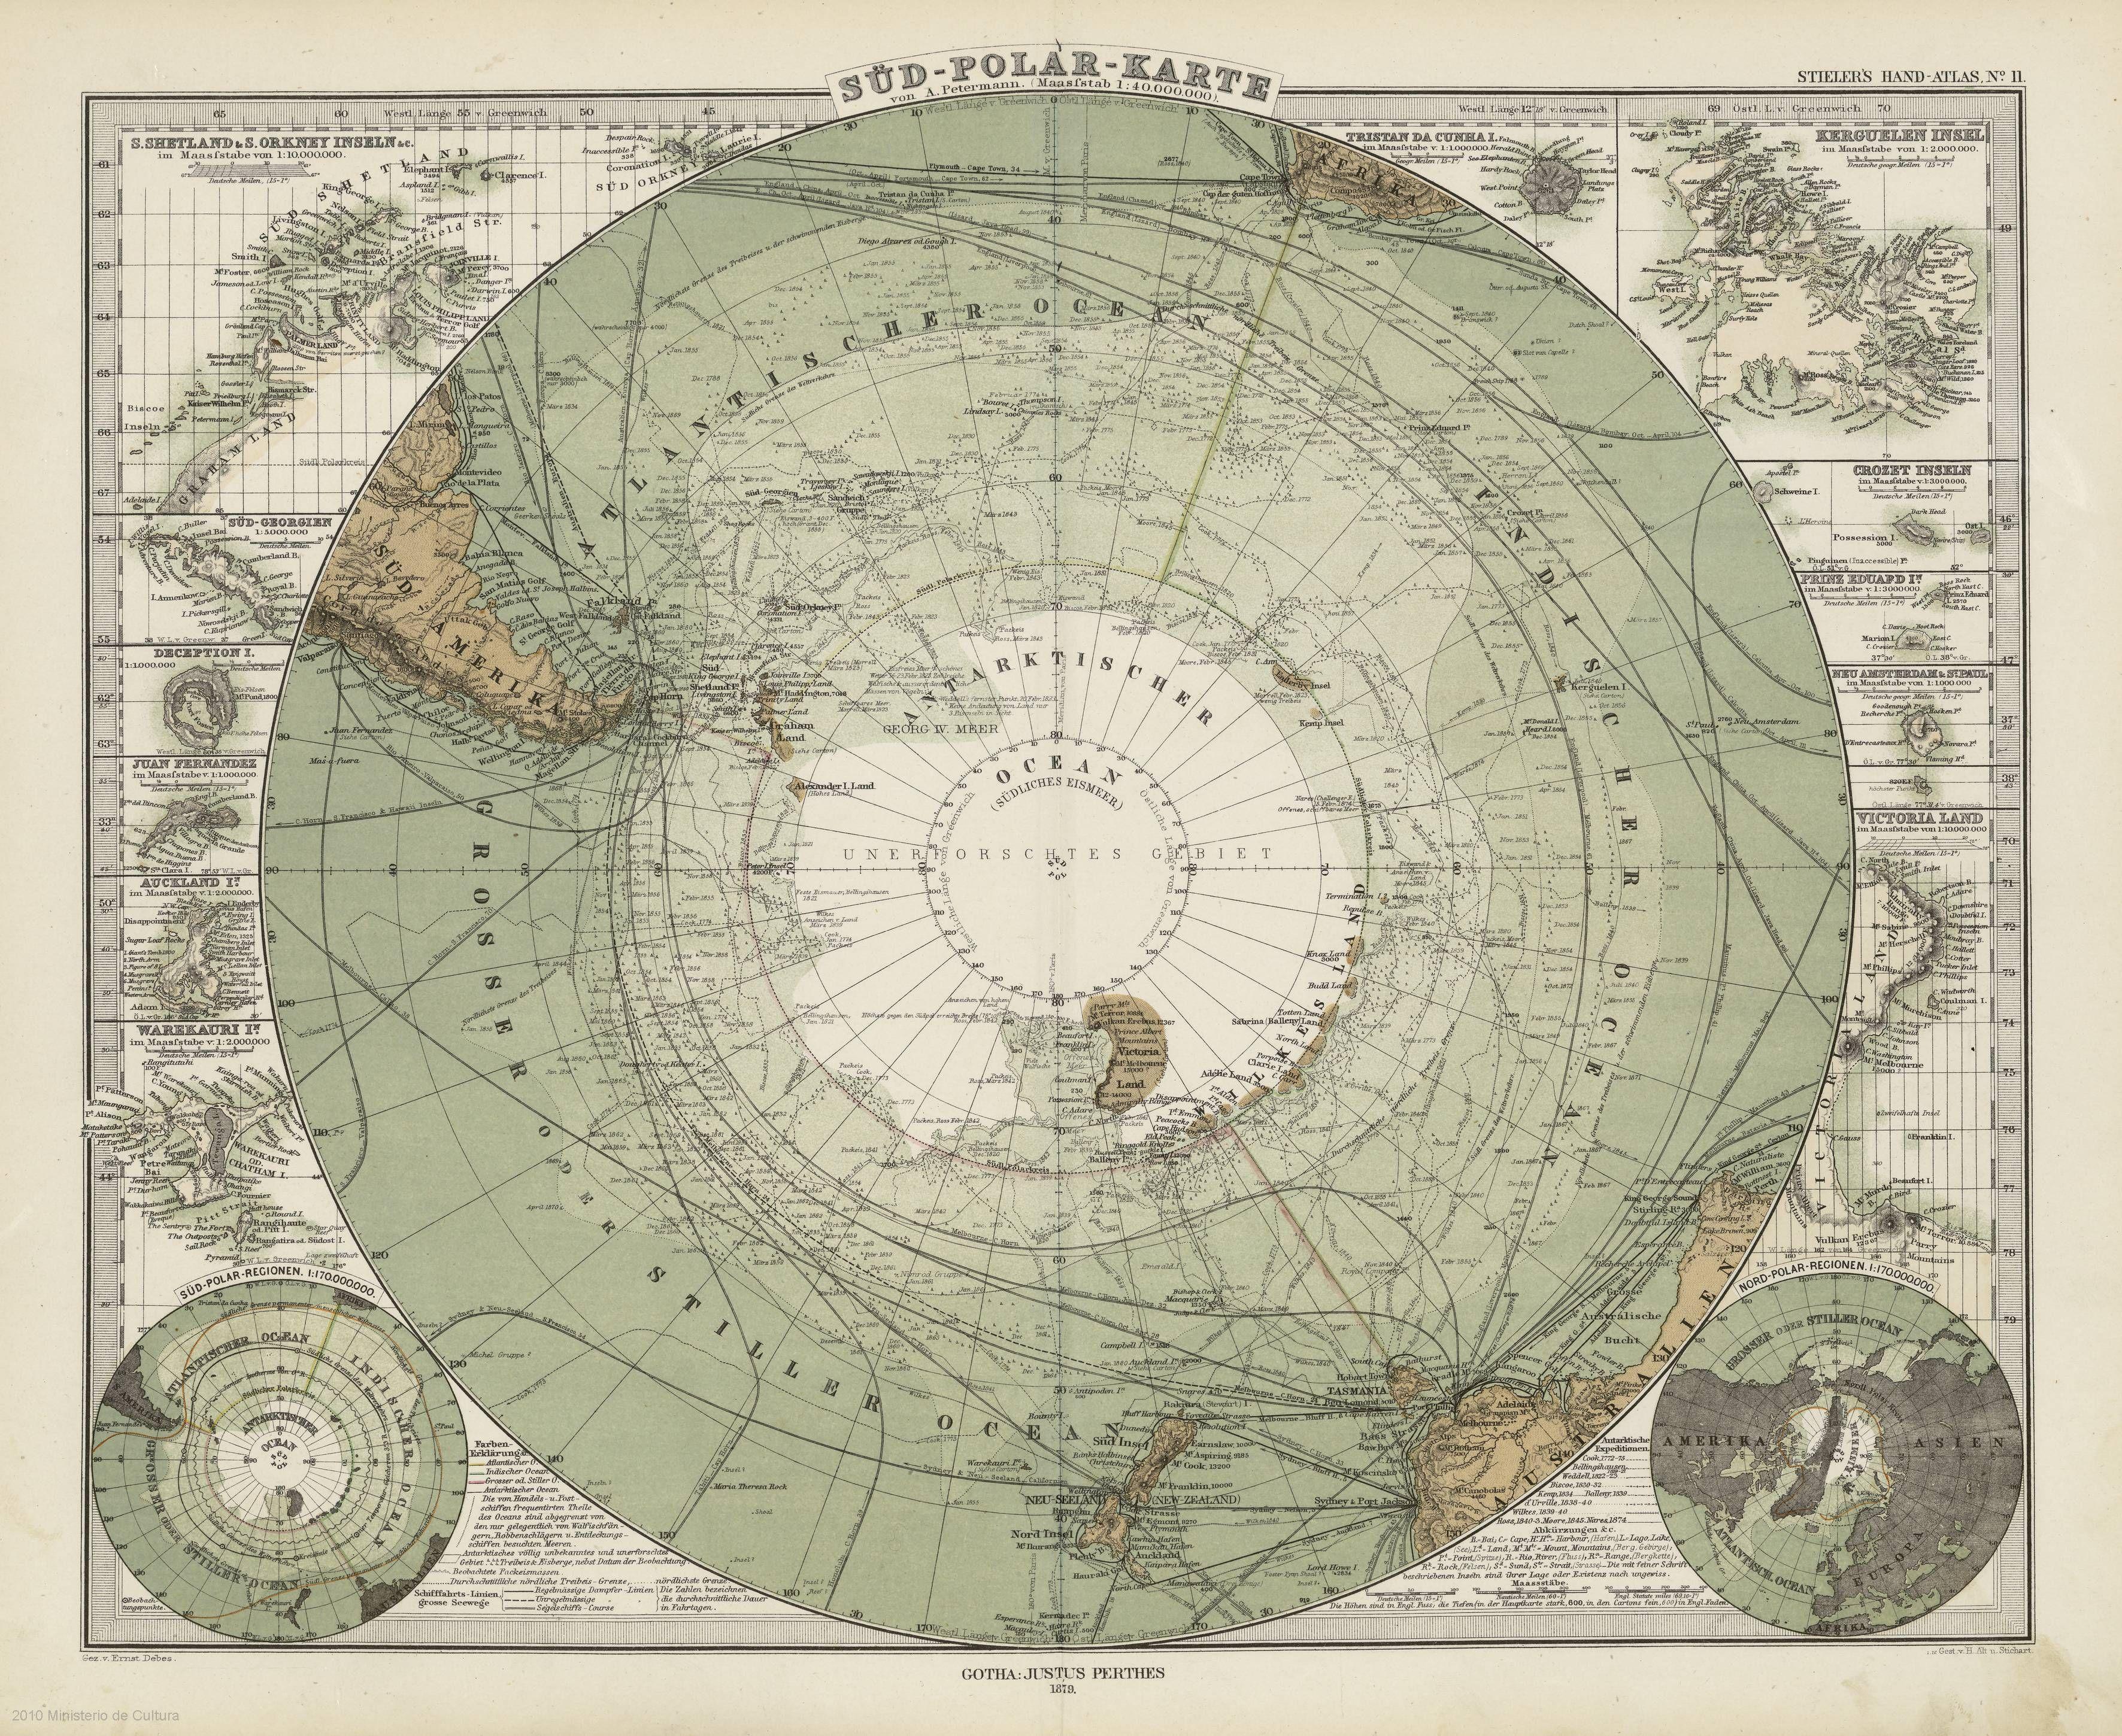 «Süd-Polar-Karte» por el cartógrafo y geógrafo von a. Petermann (1879)